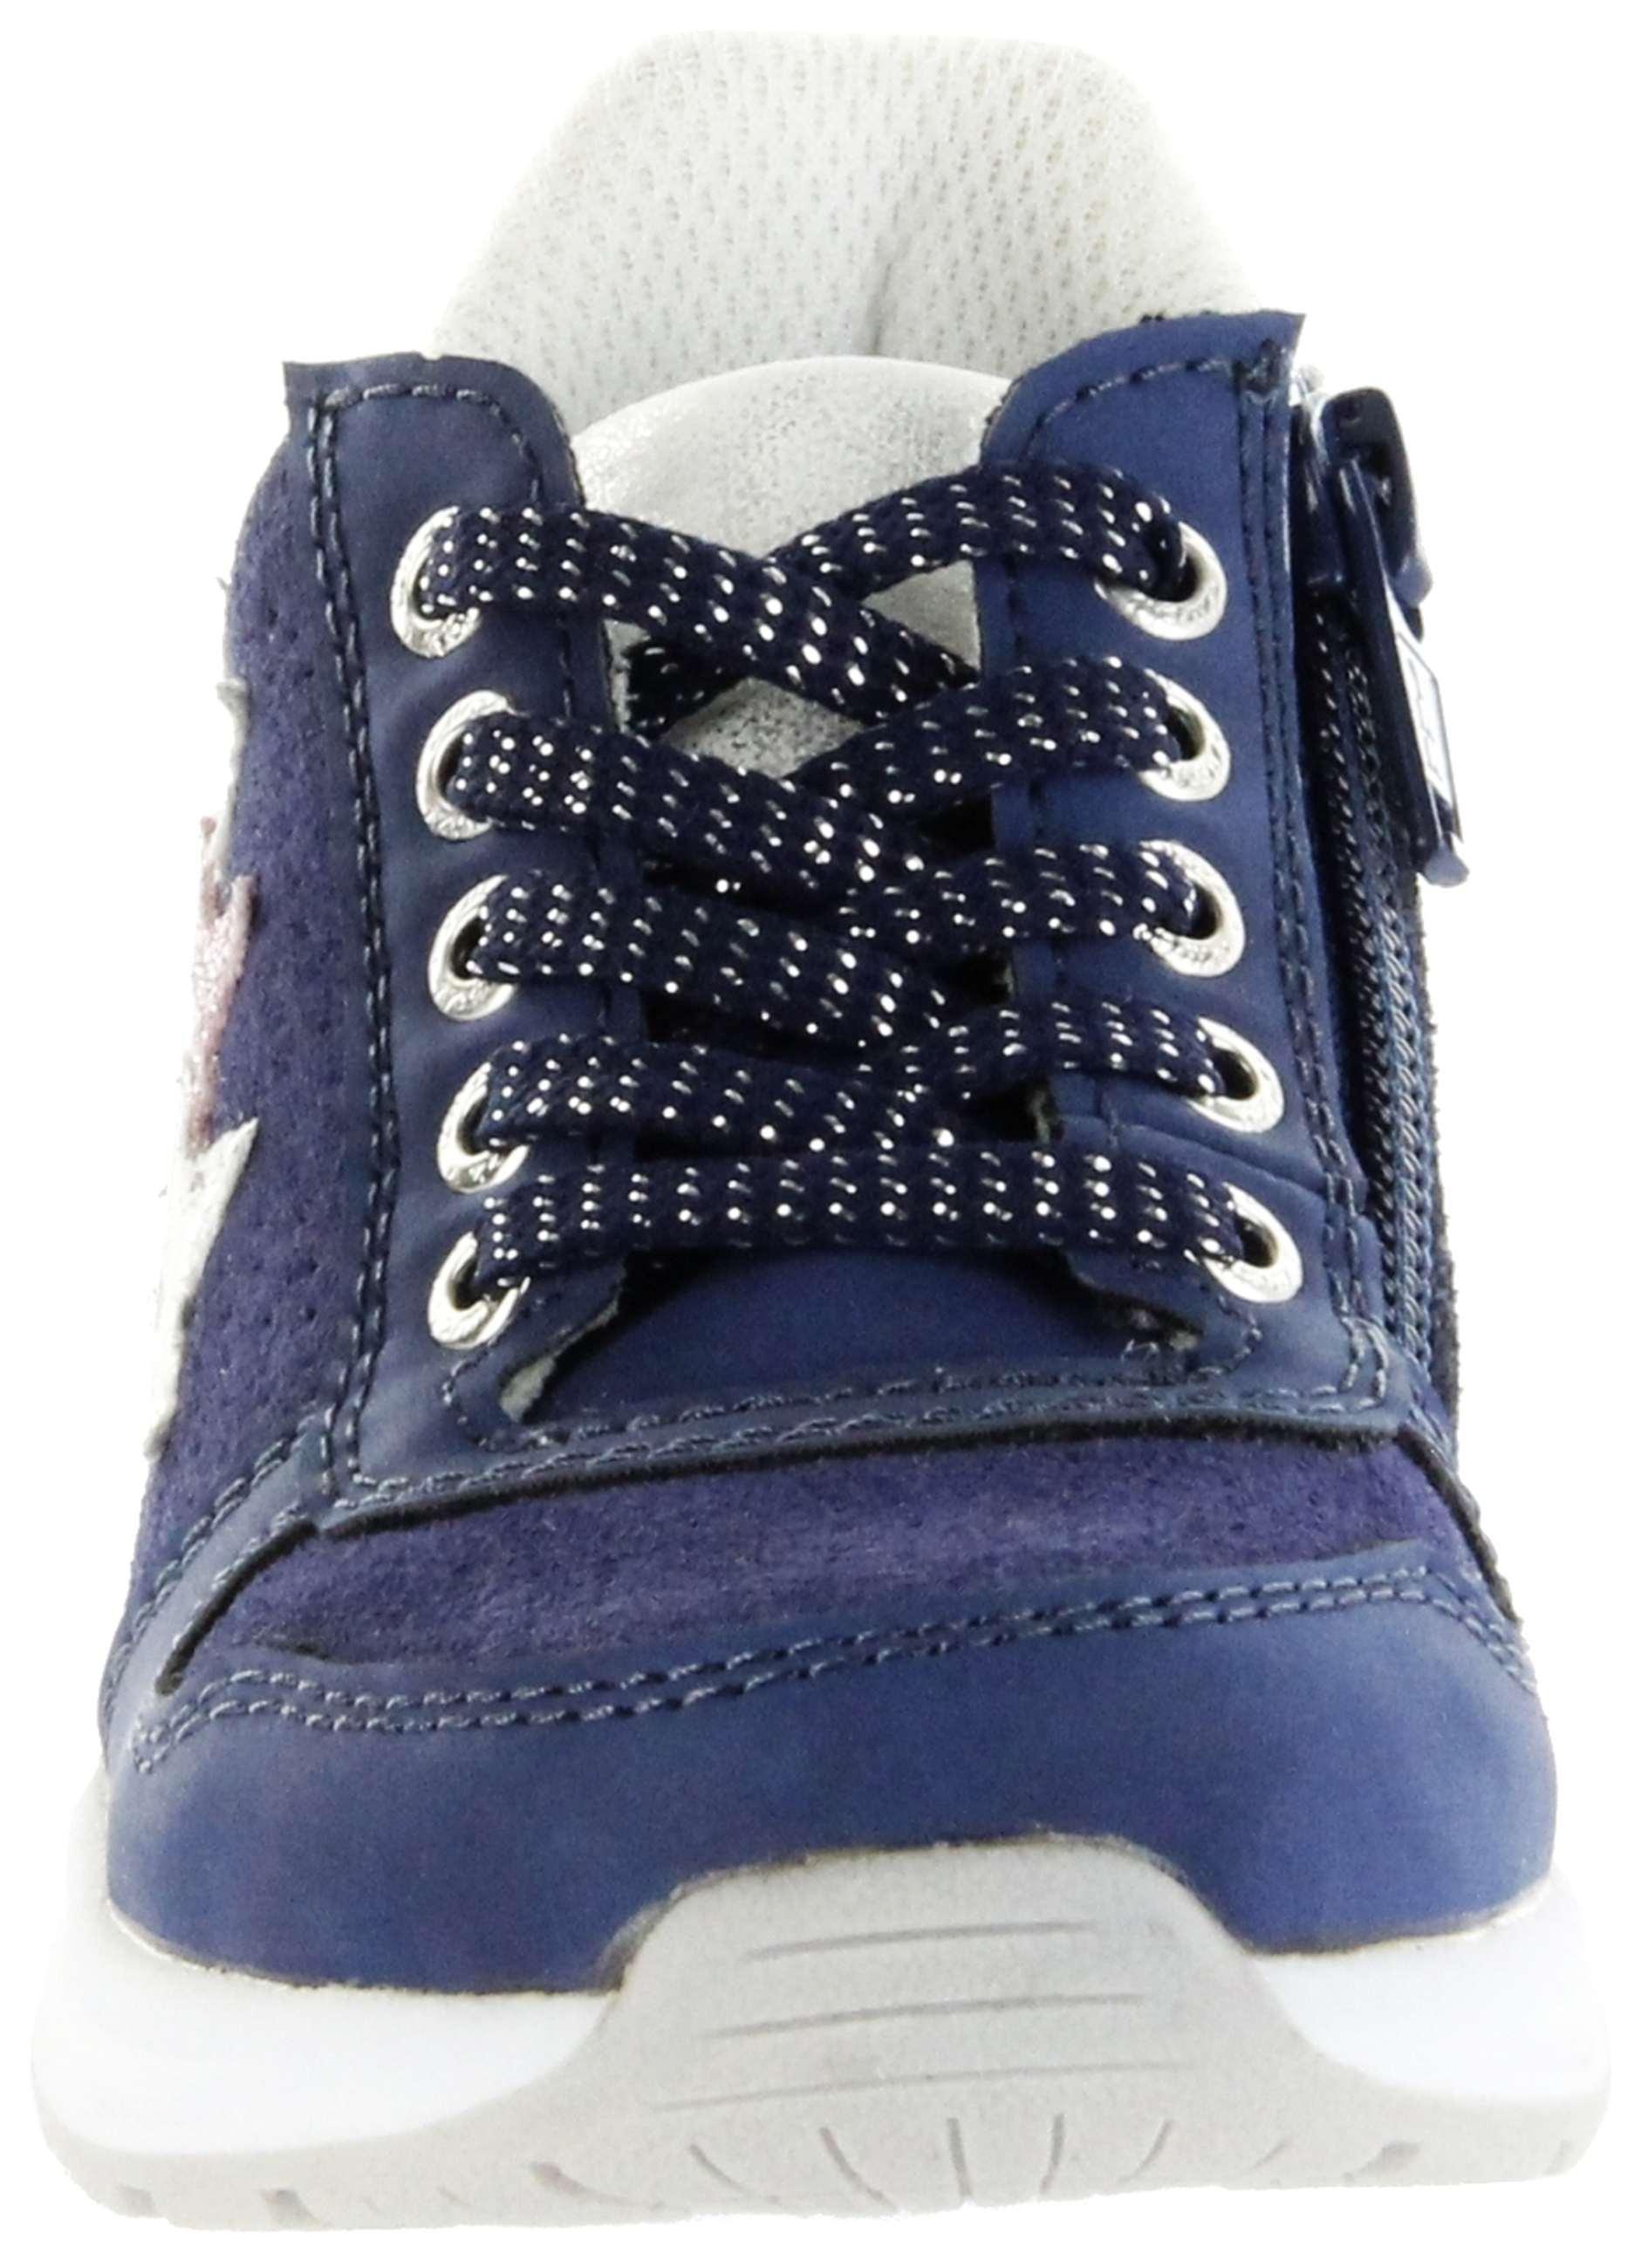 Lurchi Kinder Halbschuhe Sneaker blau Mädchen Schuhe 33 22204 42 dk. blue Verena